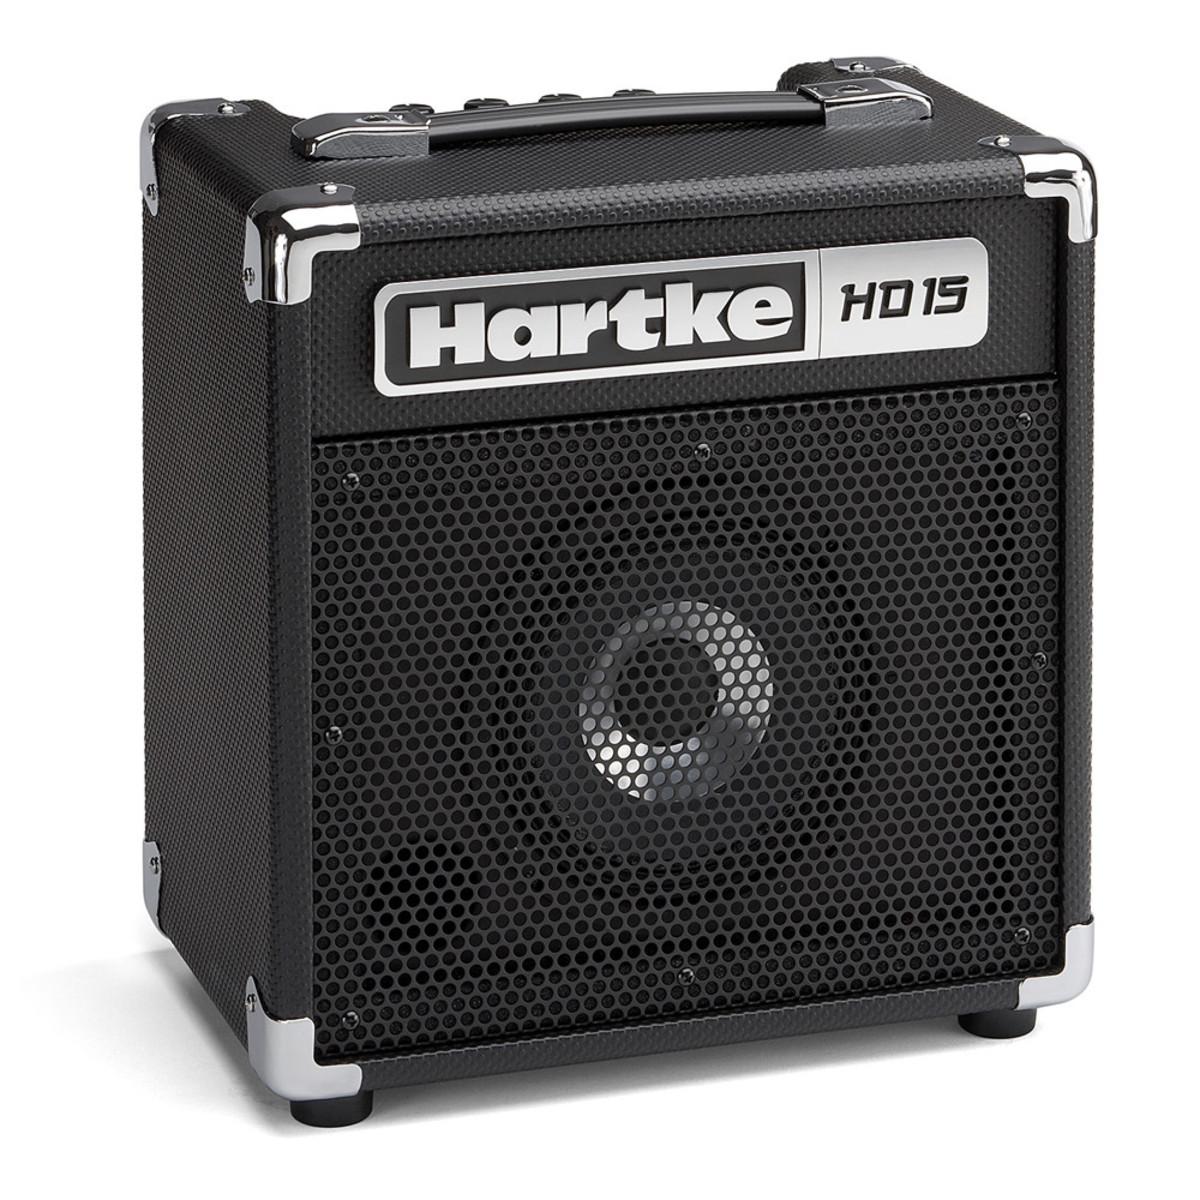 hartke hd15 bass practice amp at gear4music. Black Bedroom Furniture Sets. Home Design Ideas